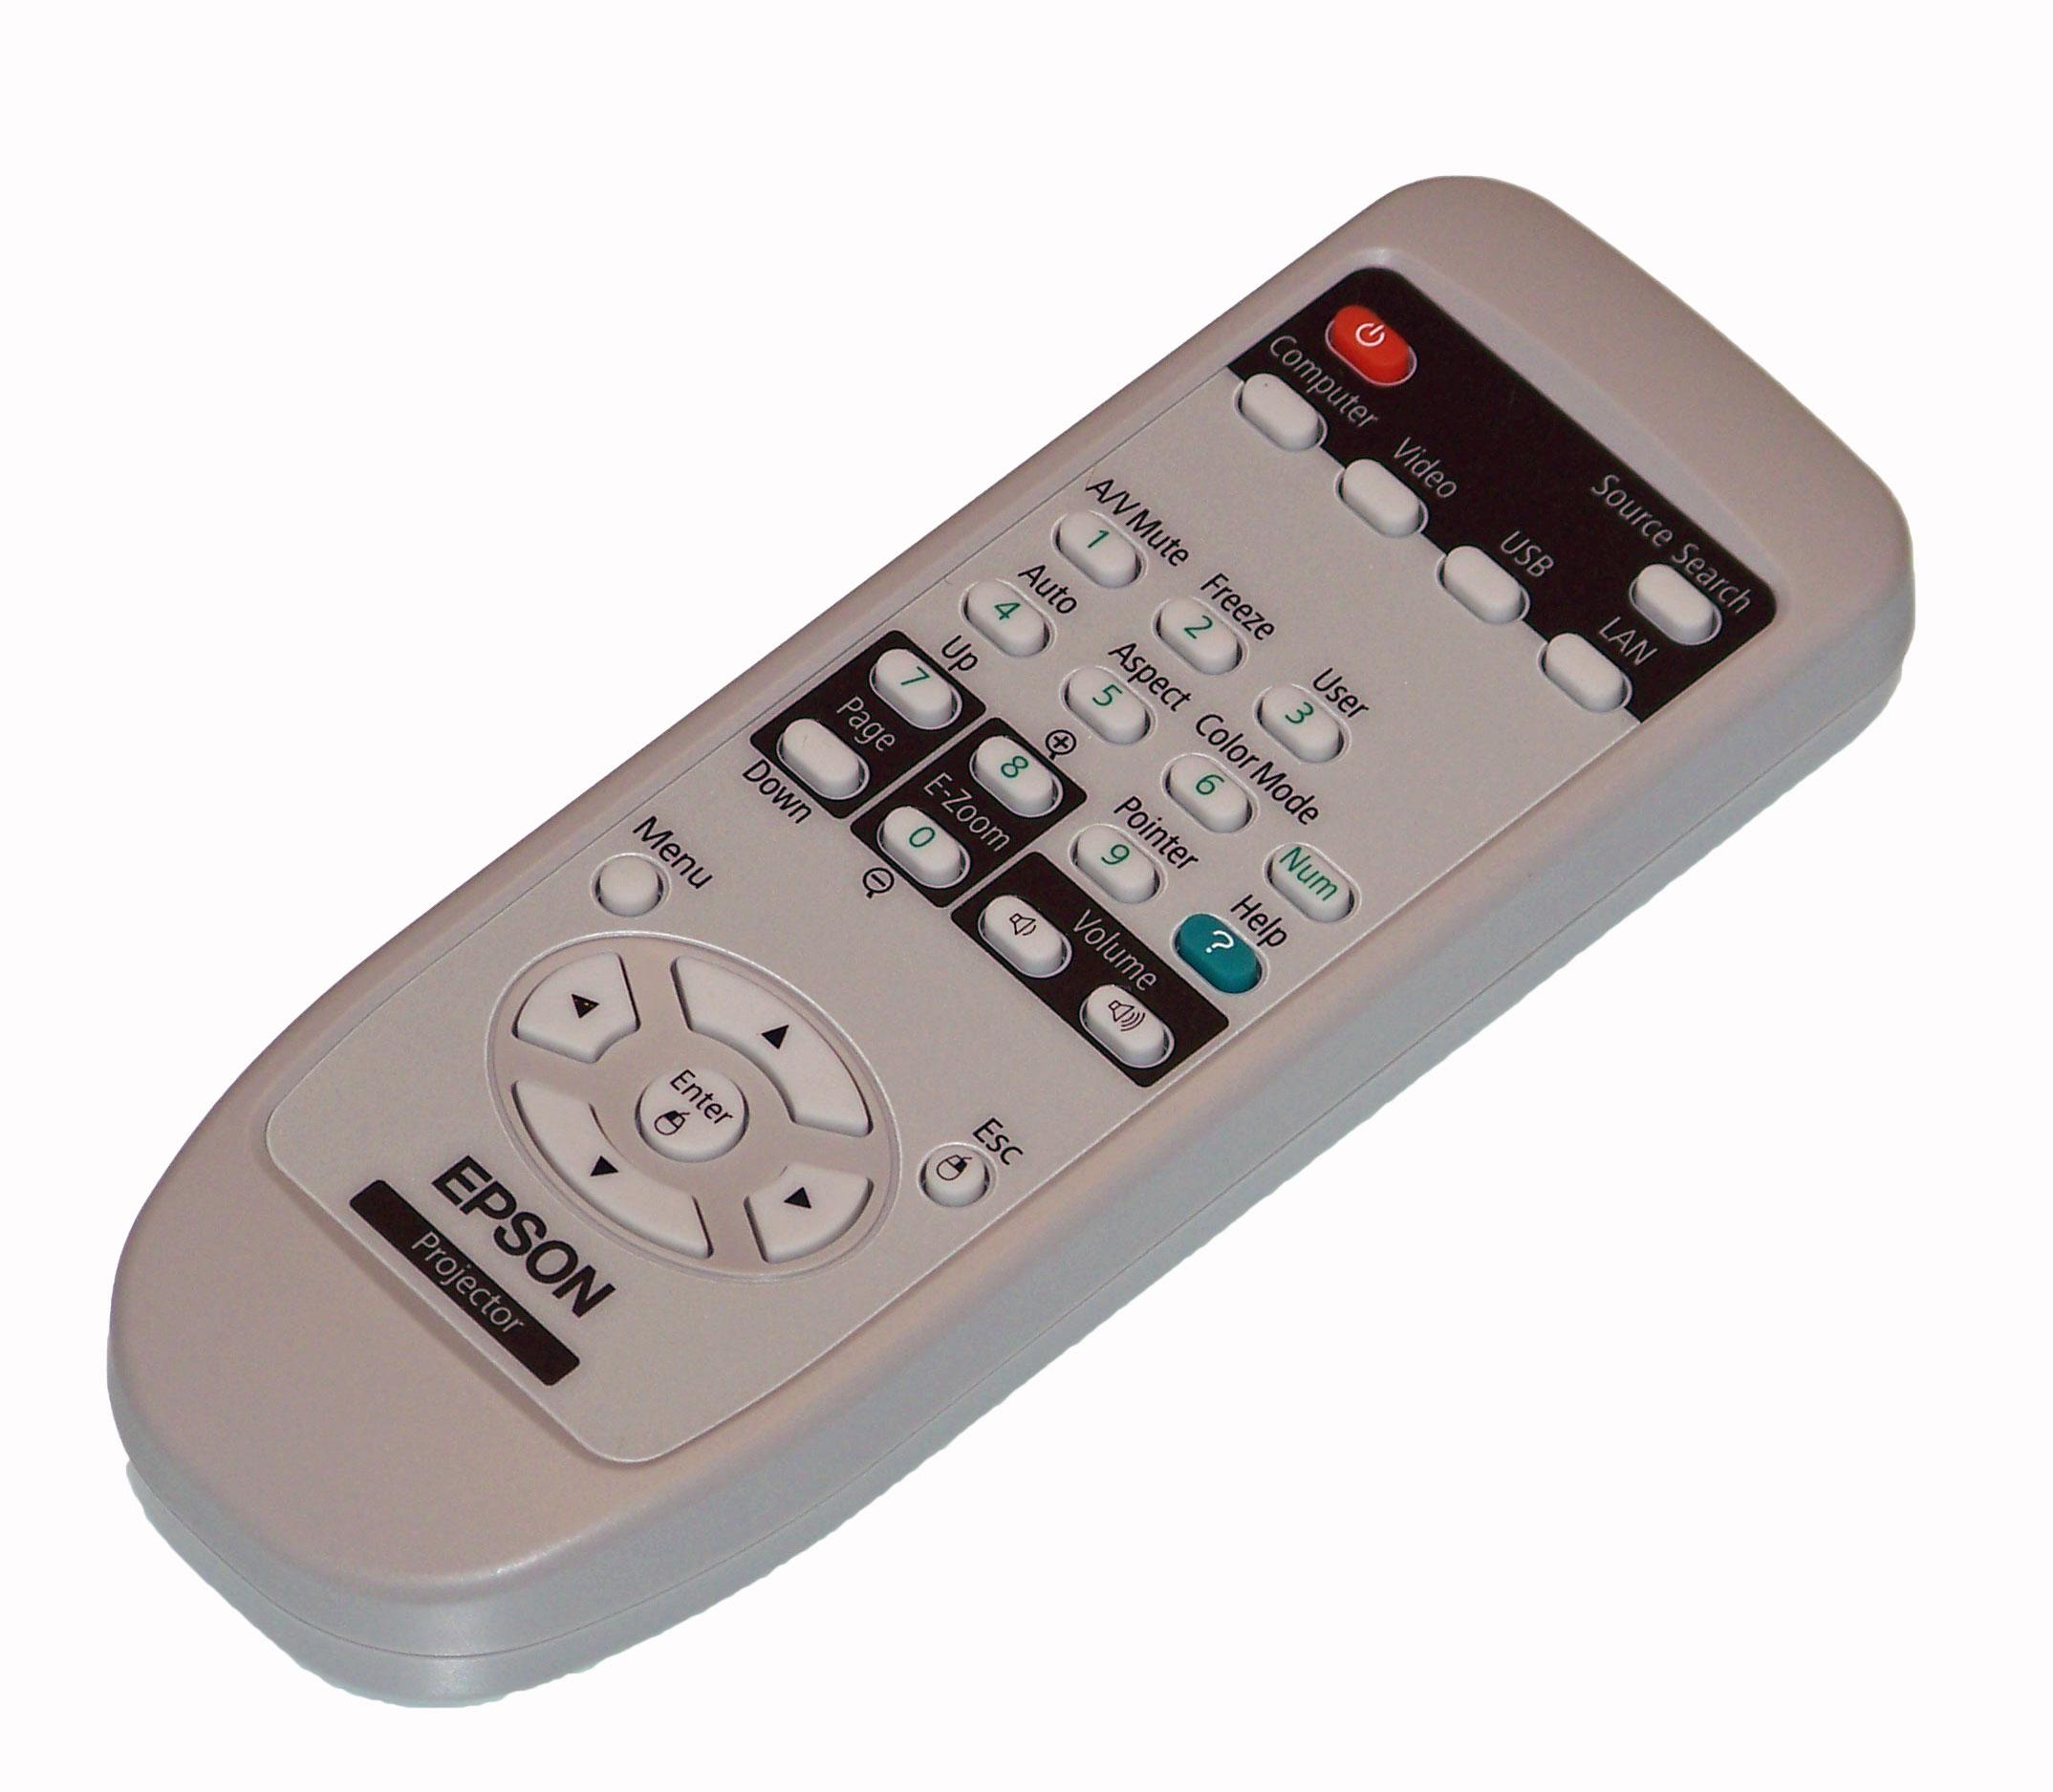 New Remote control for Epson PowerLite EX51 EX71 X9 VS200 822p Projector